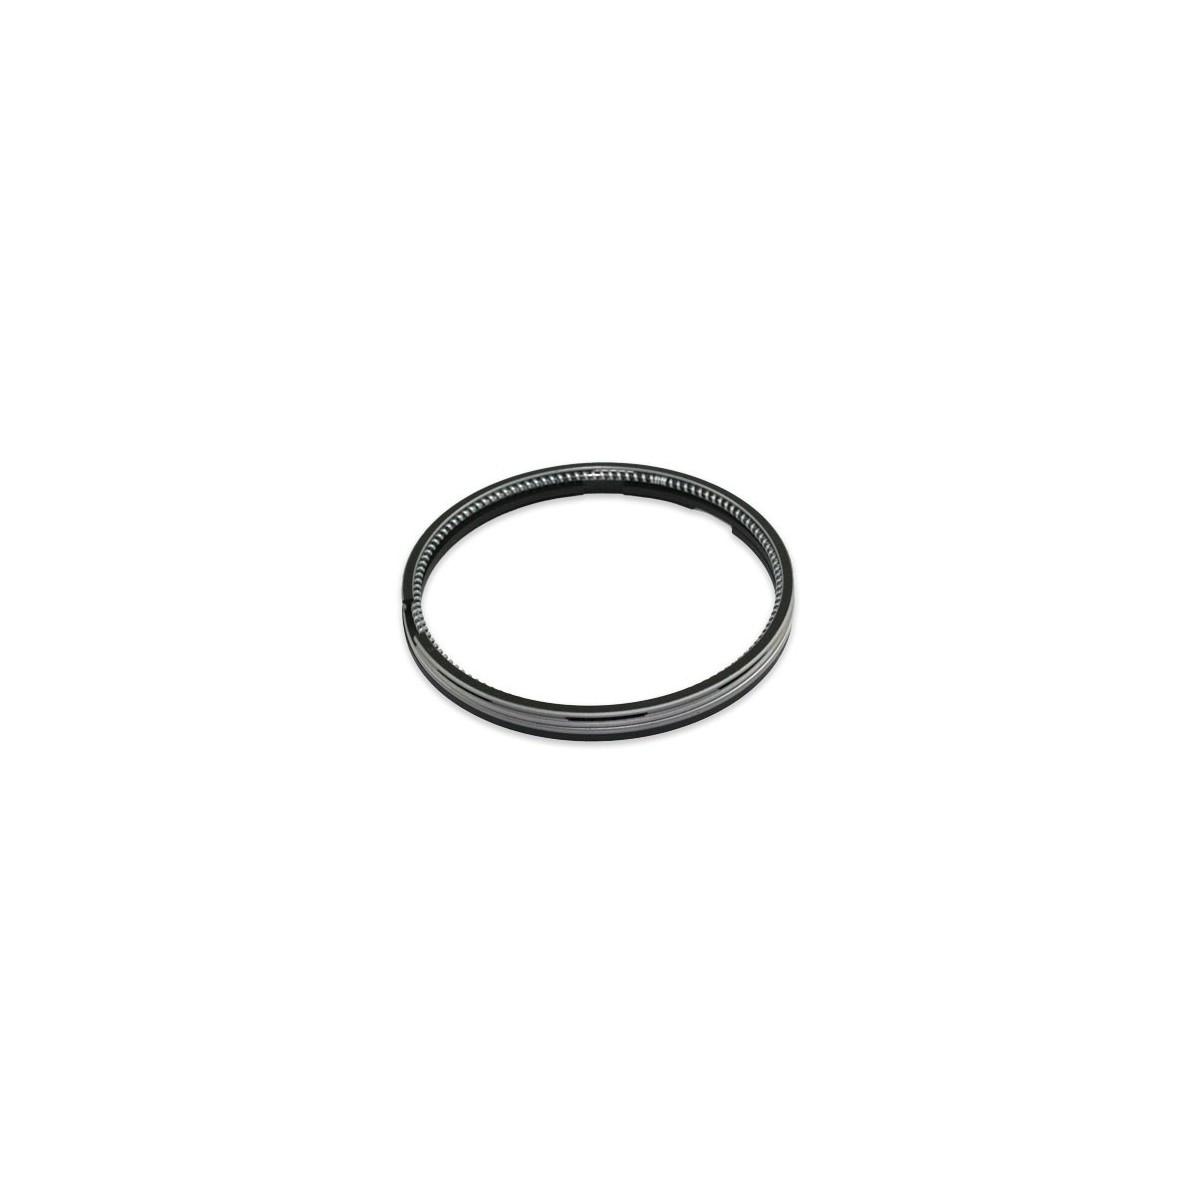 Piston Ring Set Yanmar F20 82mm.